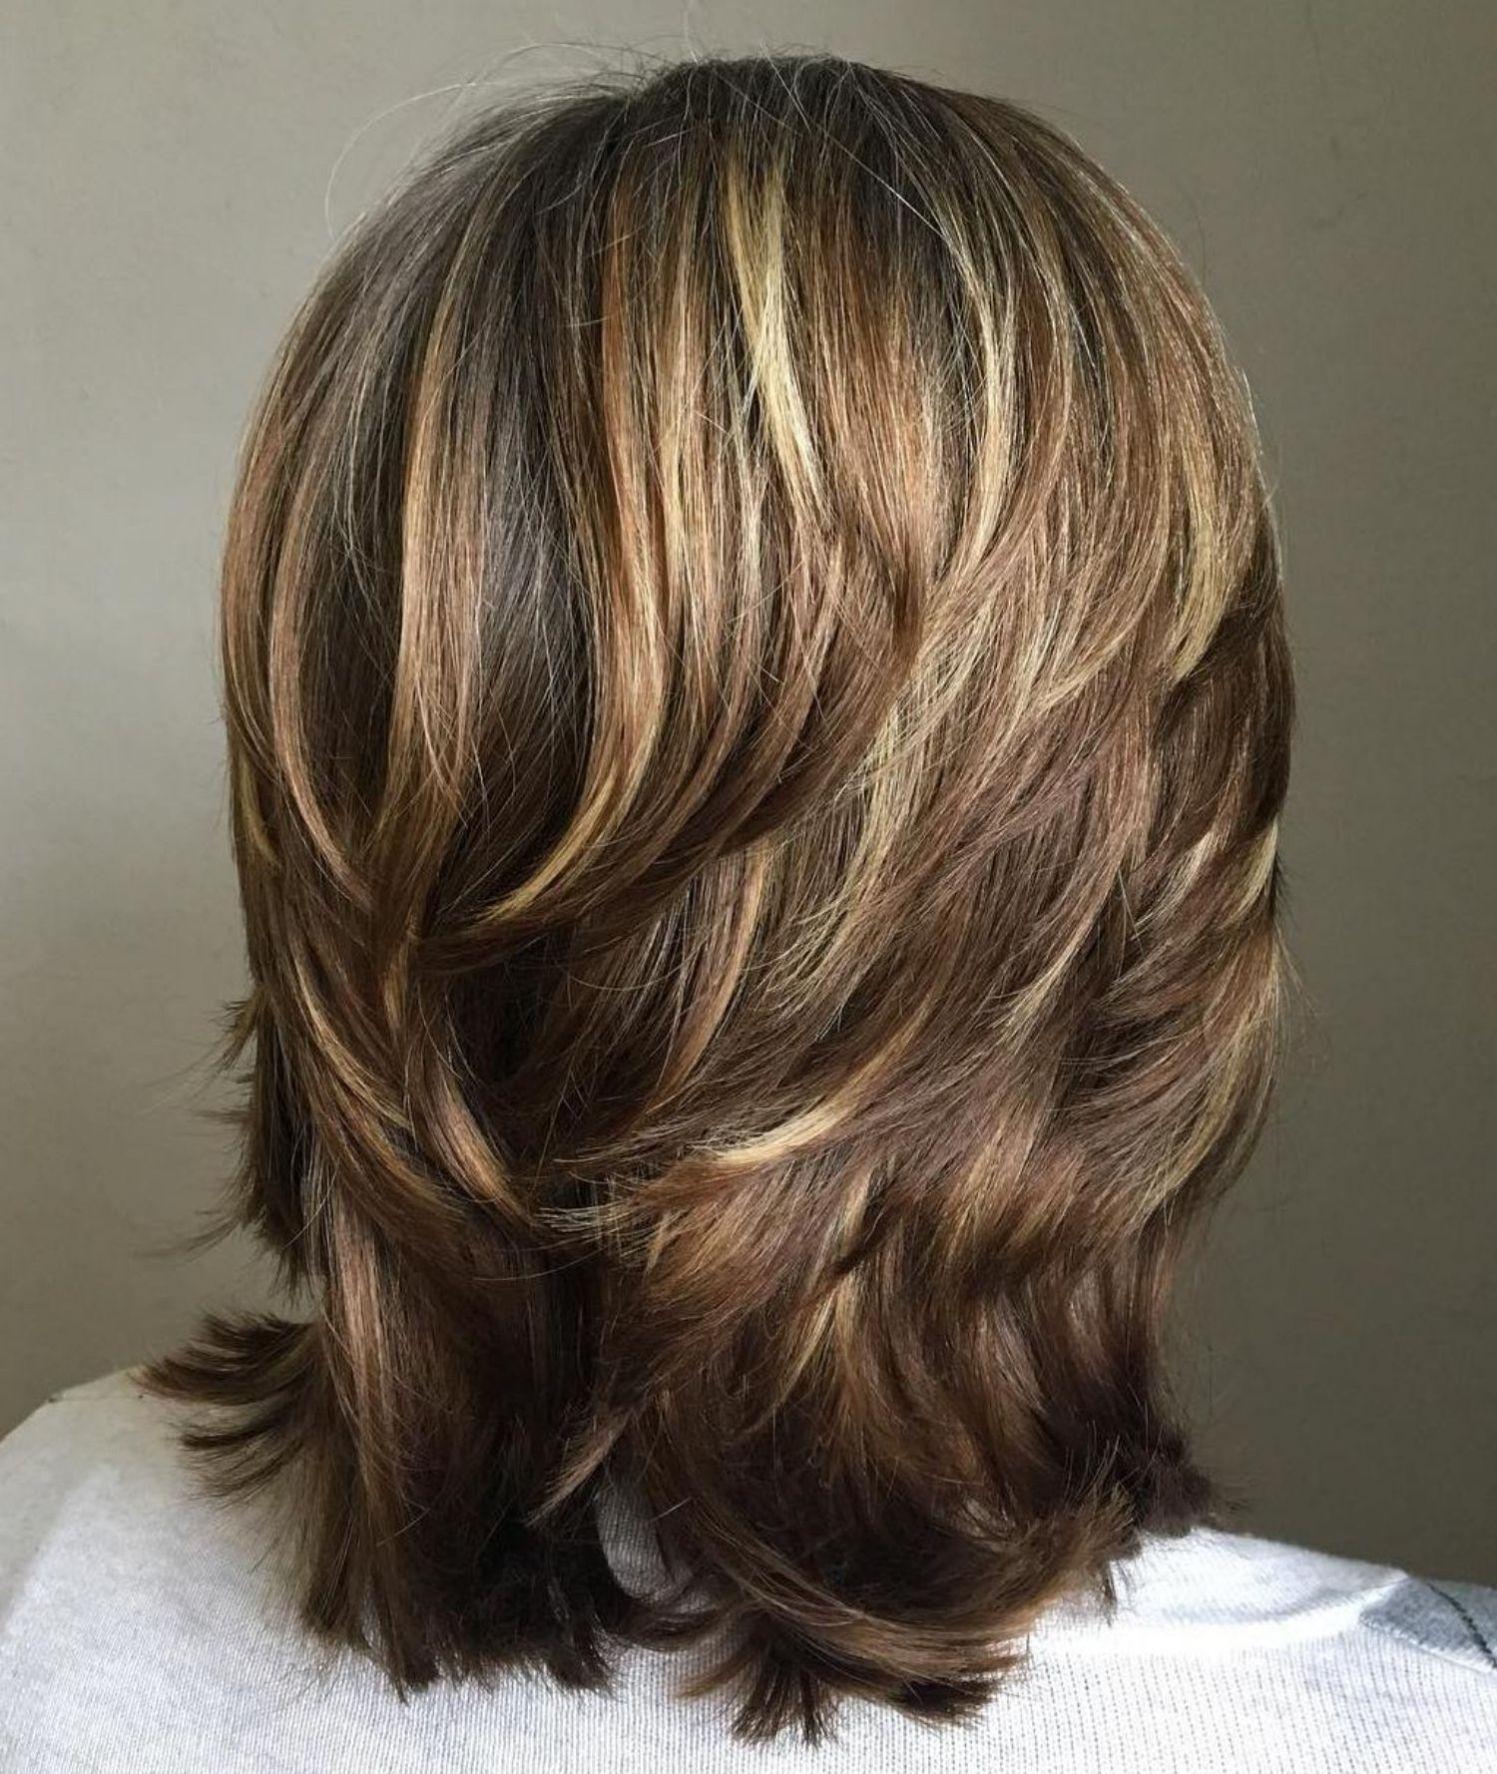 Medium Length Choppy Layered Hairstyle